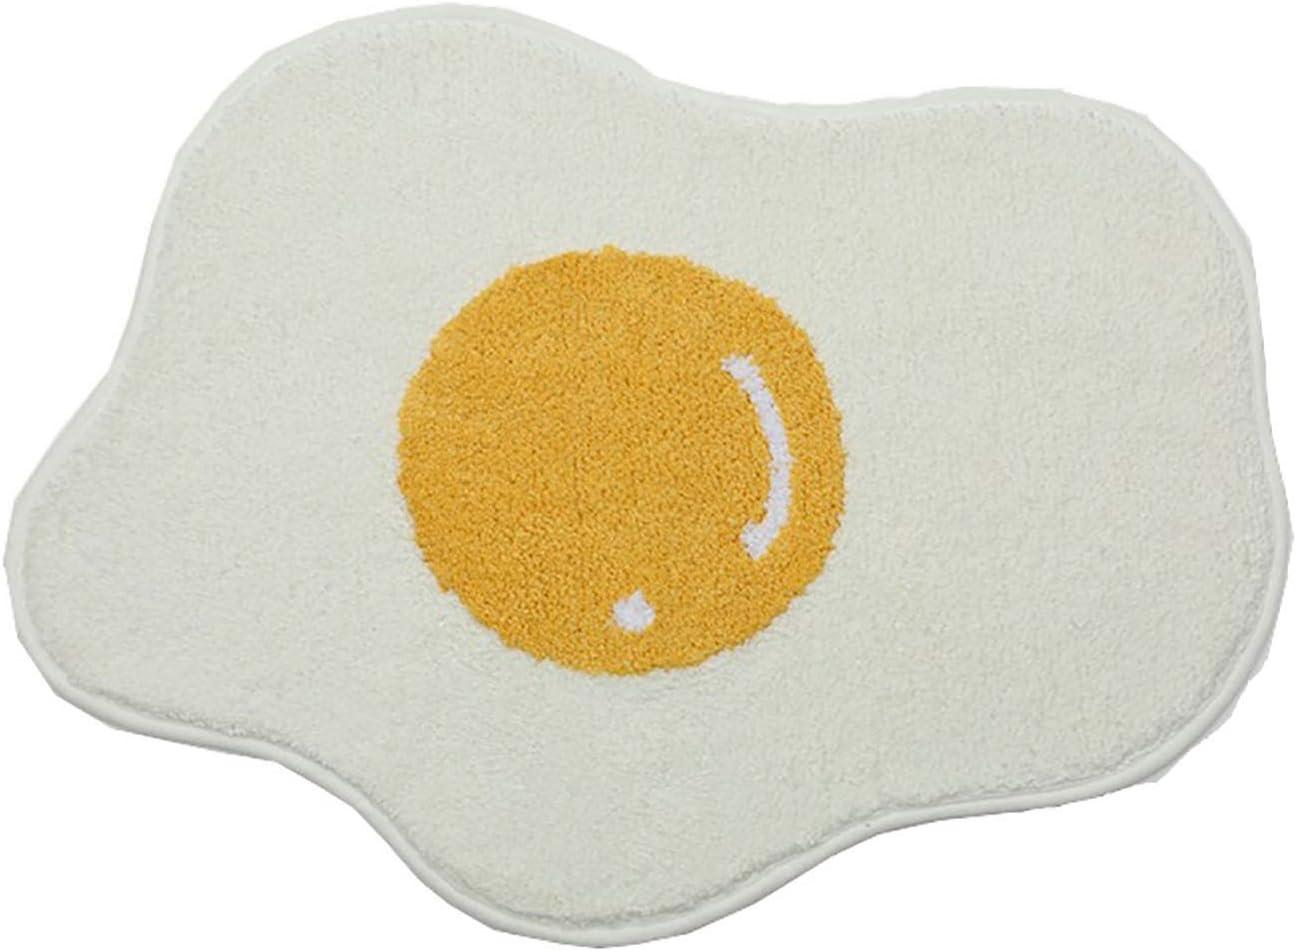 AILSAYA Bath Mat Kids Bathroom Cartoon Rugs Egg Purchase New color Shape